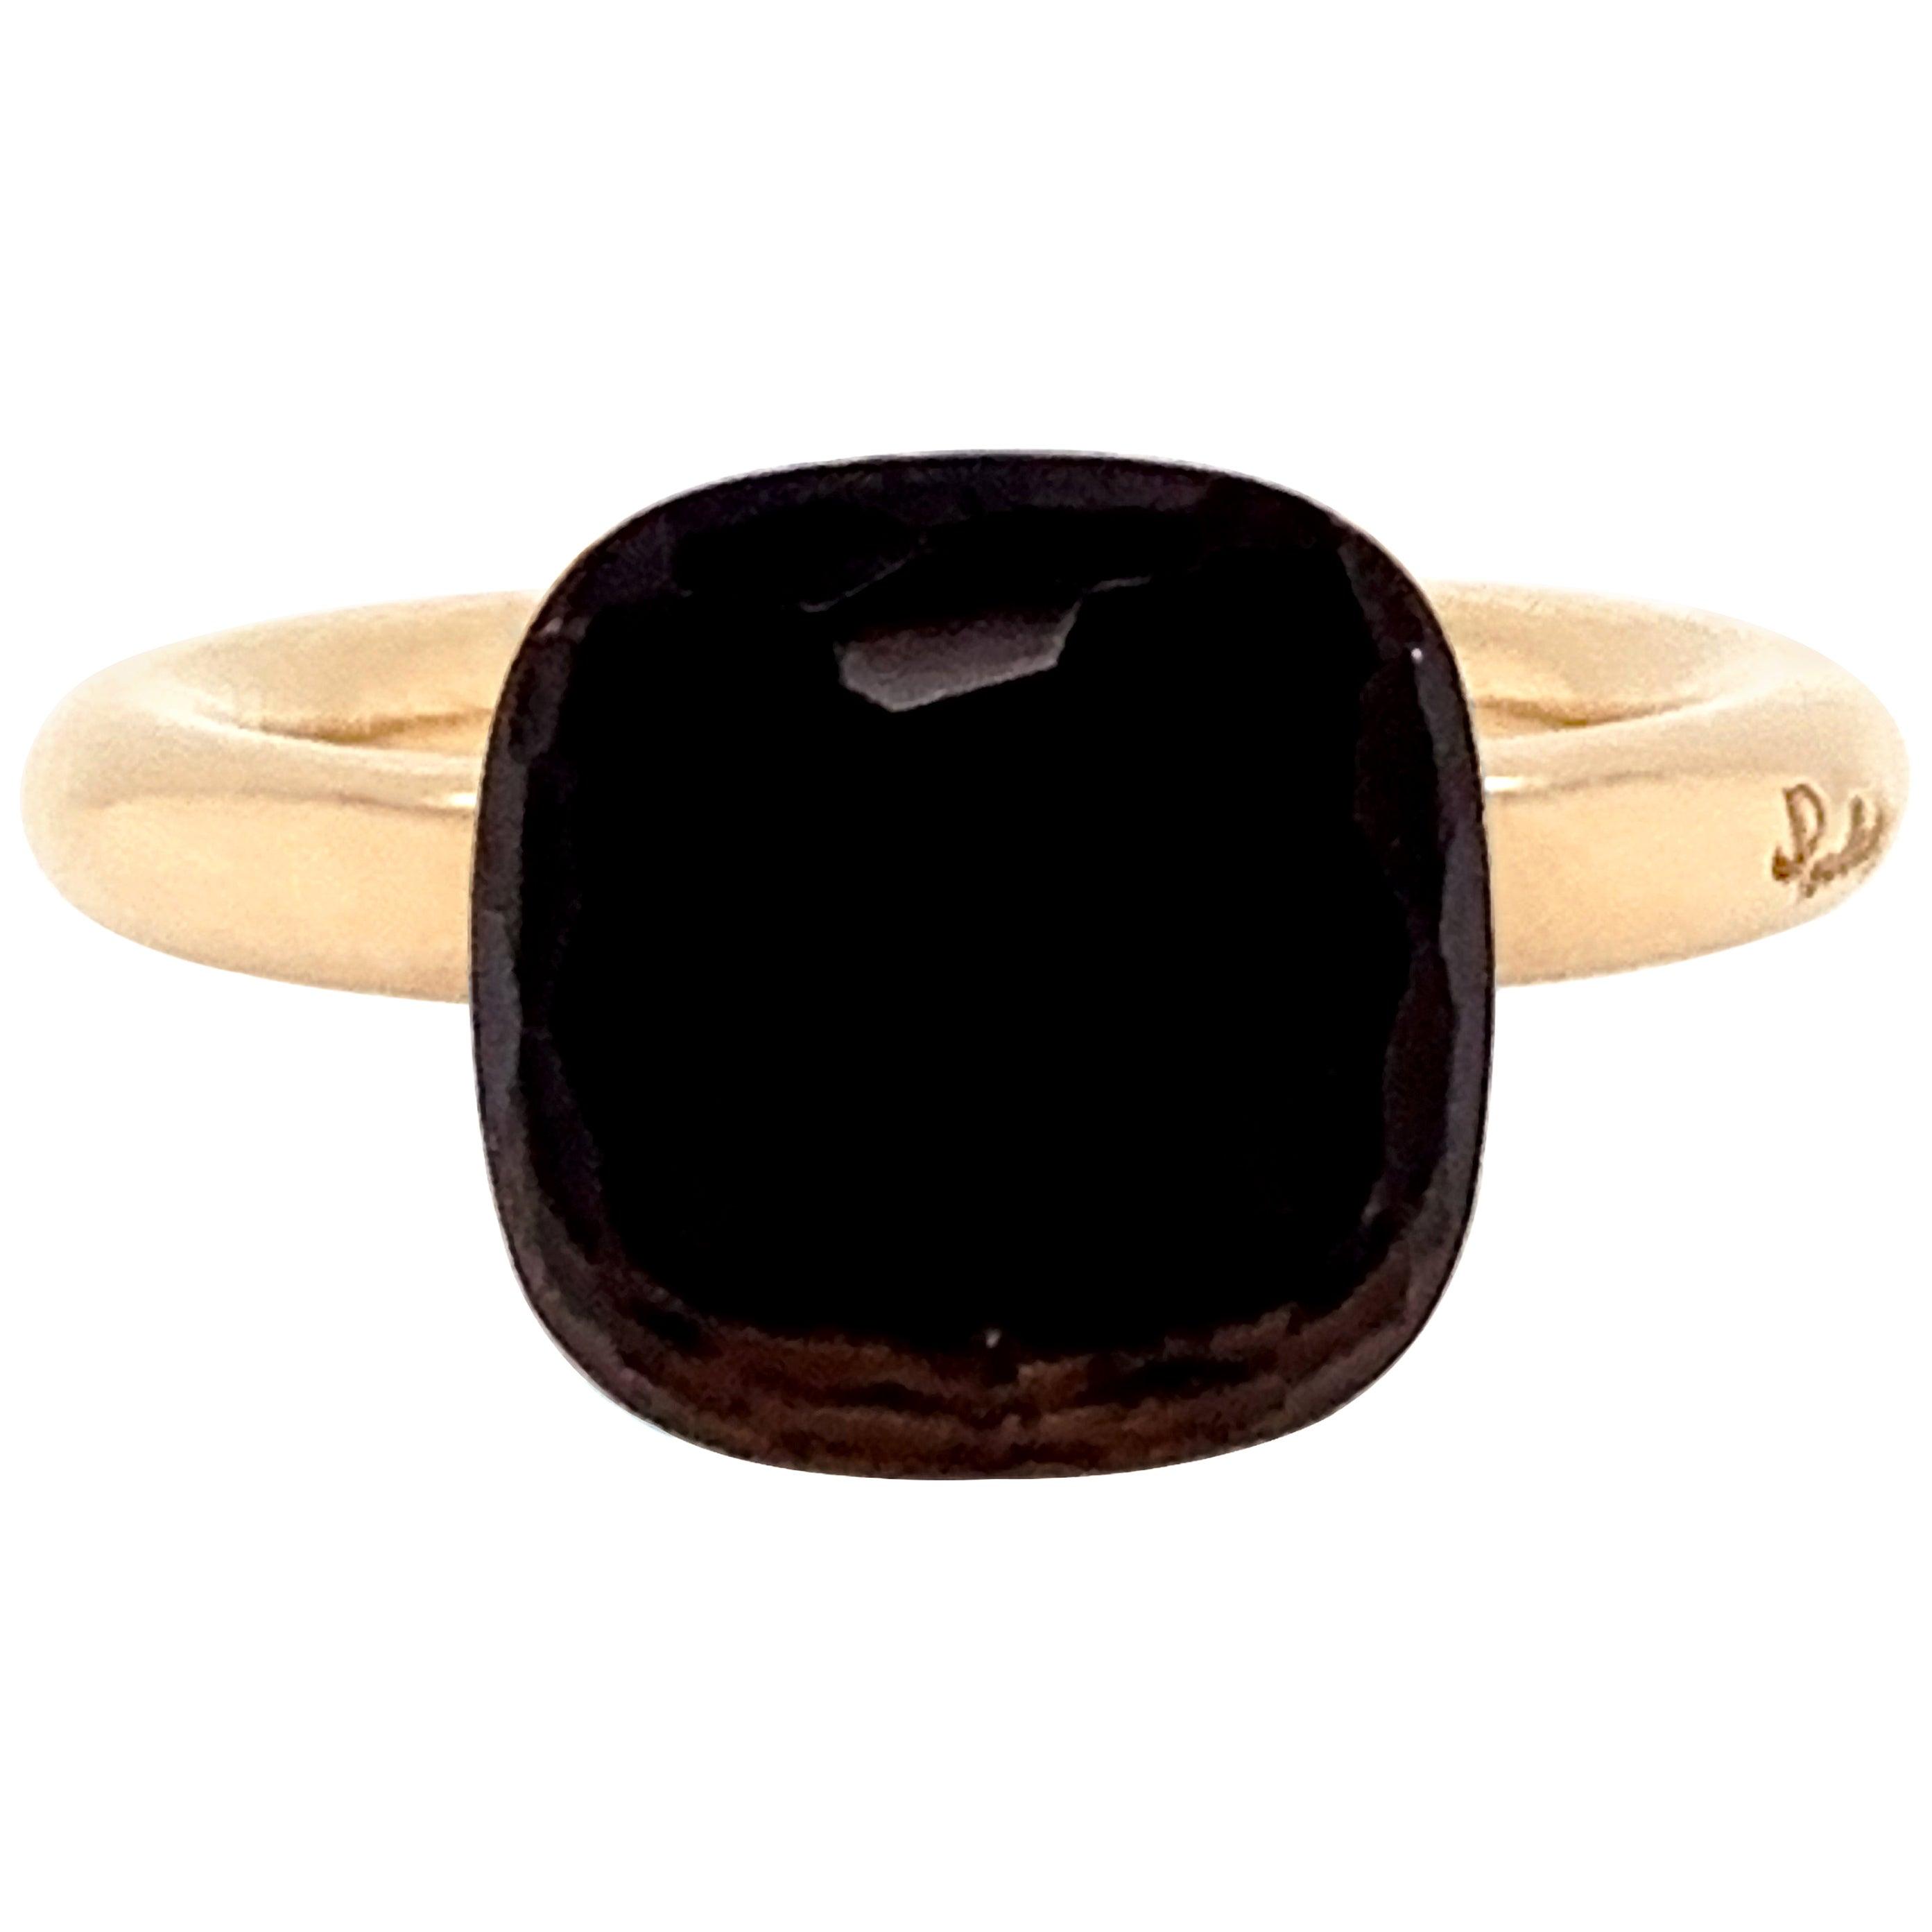 Pomellato Nudo Collection Smokey Quartz 18 Carat Rose Gold Ring